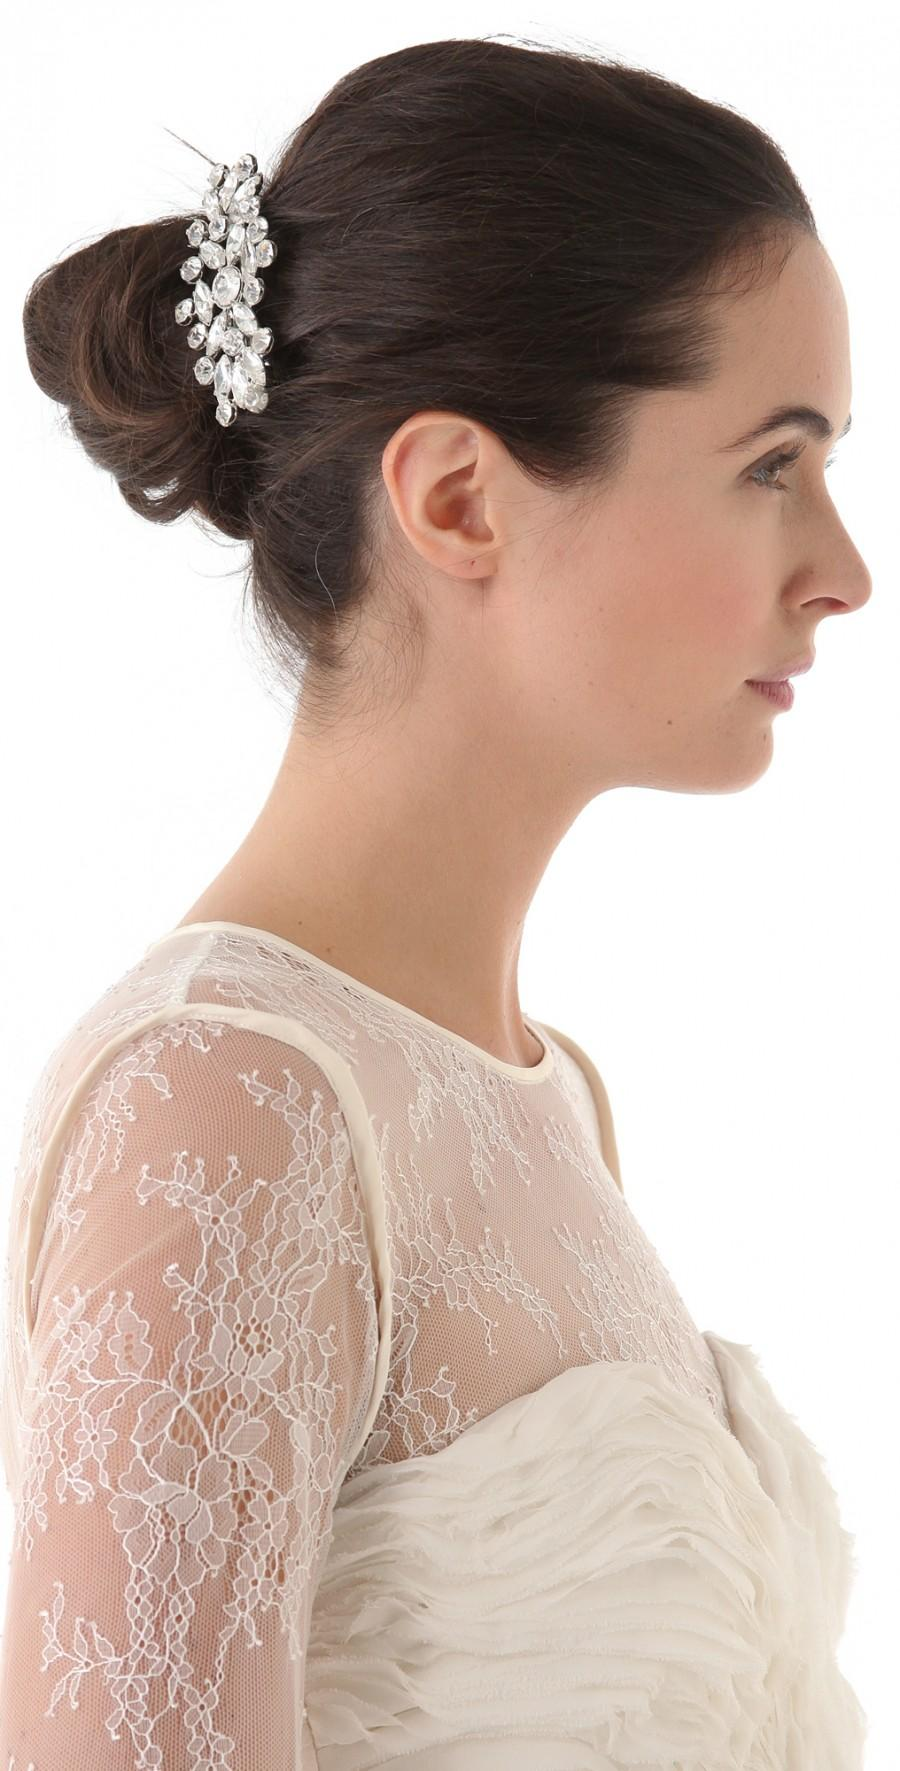 updo hair model - rhinestones wedding hair clip #1331927 - weddbook